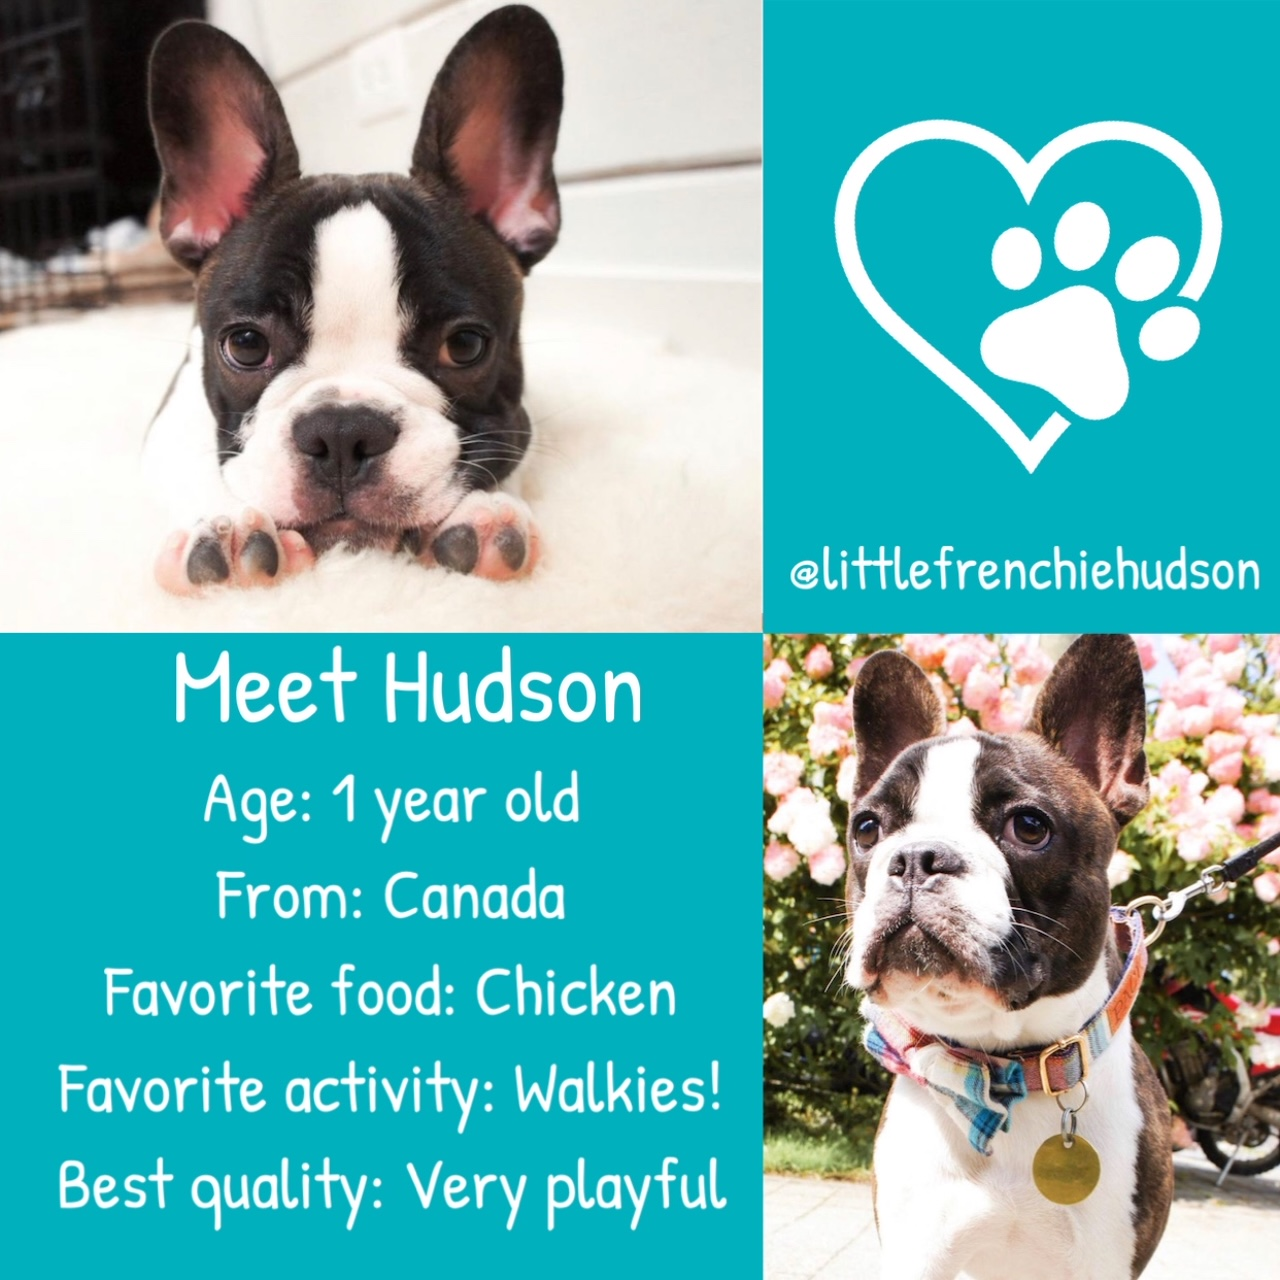 Hudson the French Bulldog